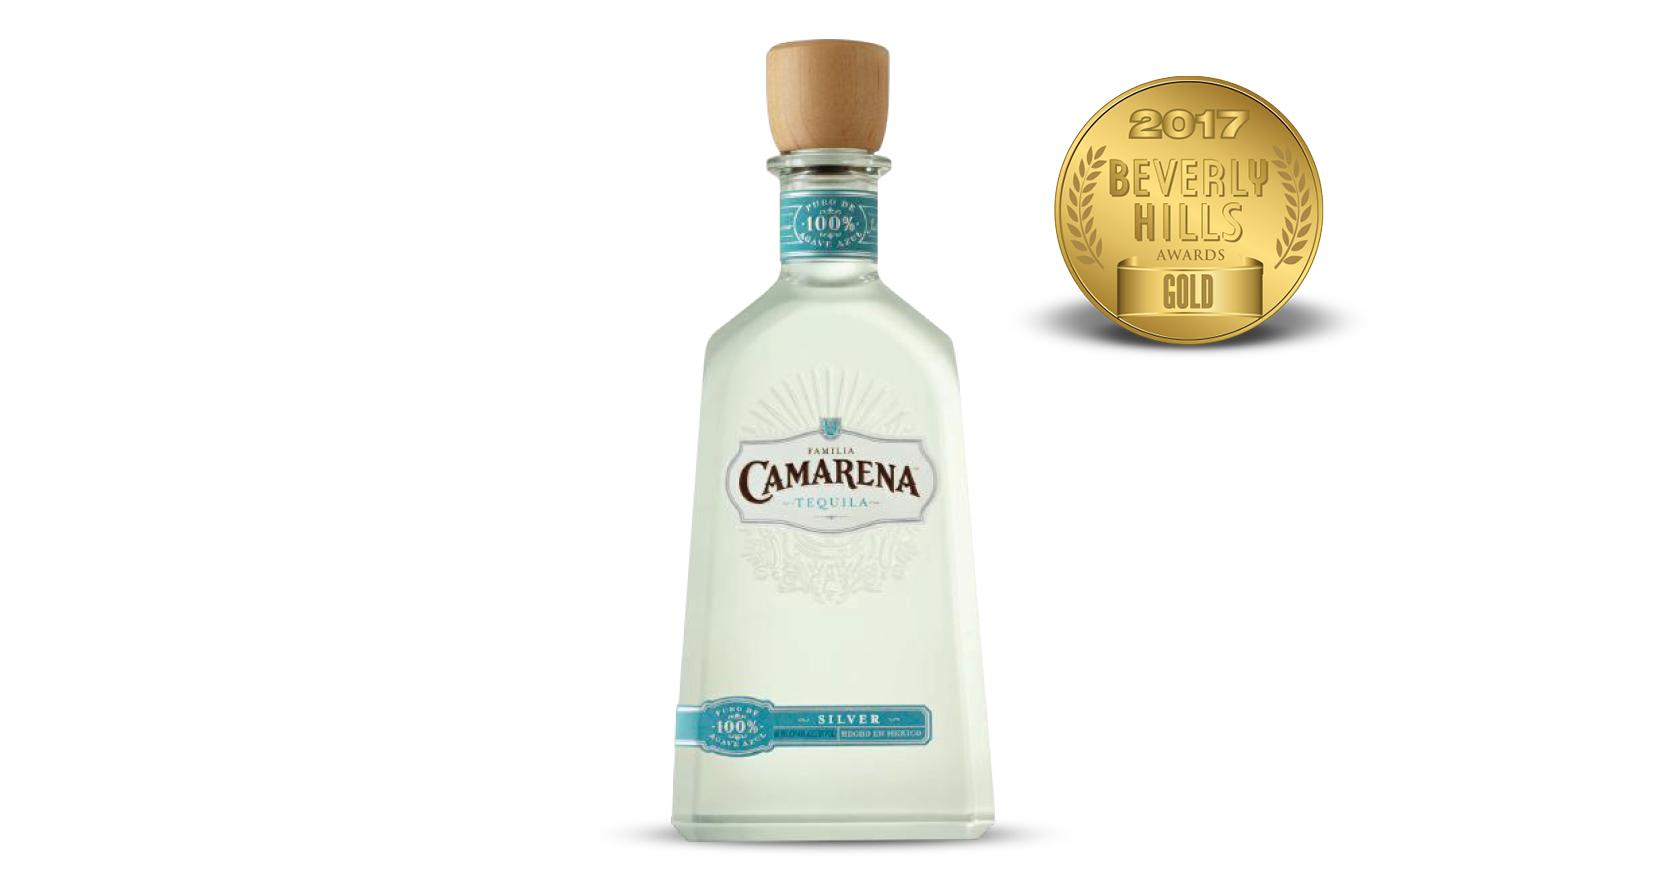 Famila Camarena Silver Tequila